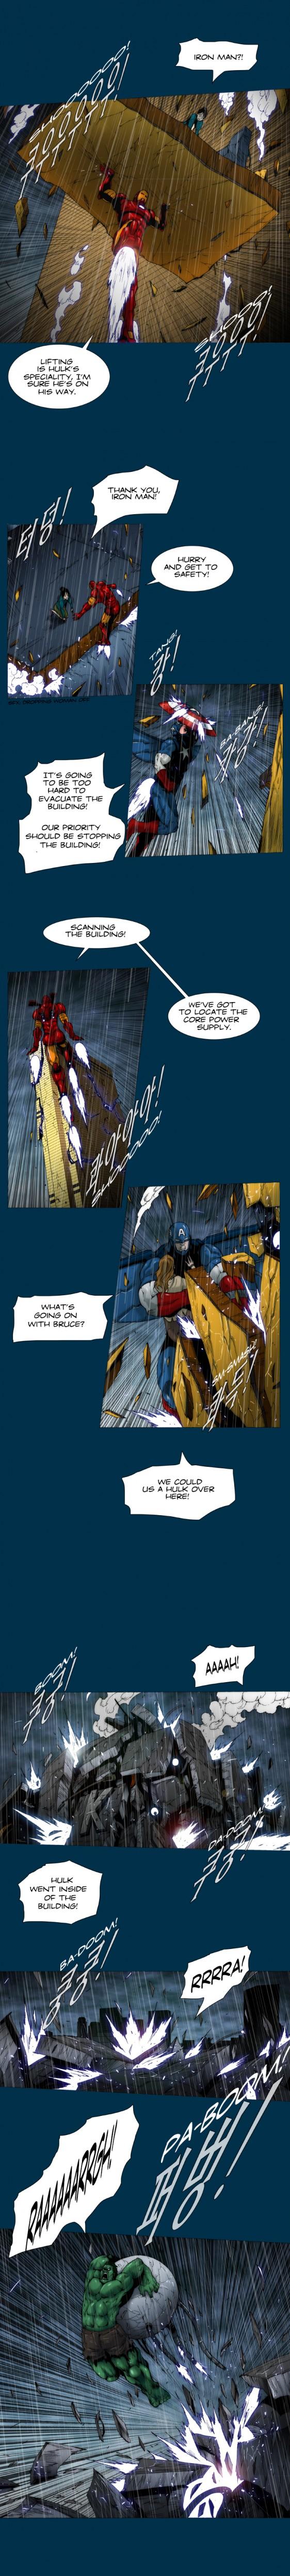 avengers-electric-rain-11-3